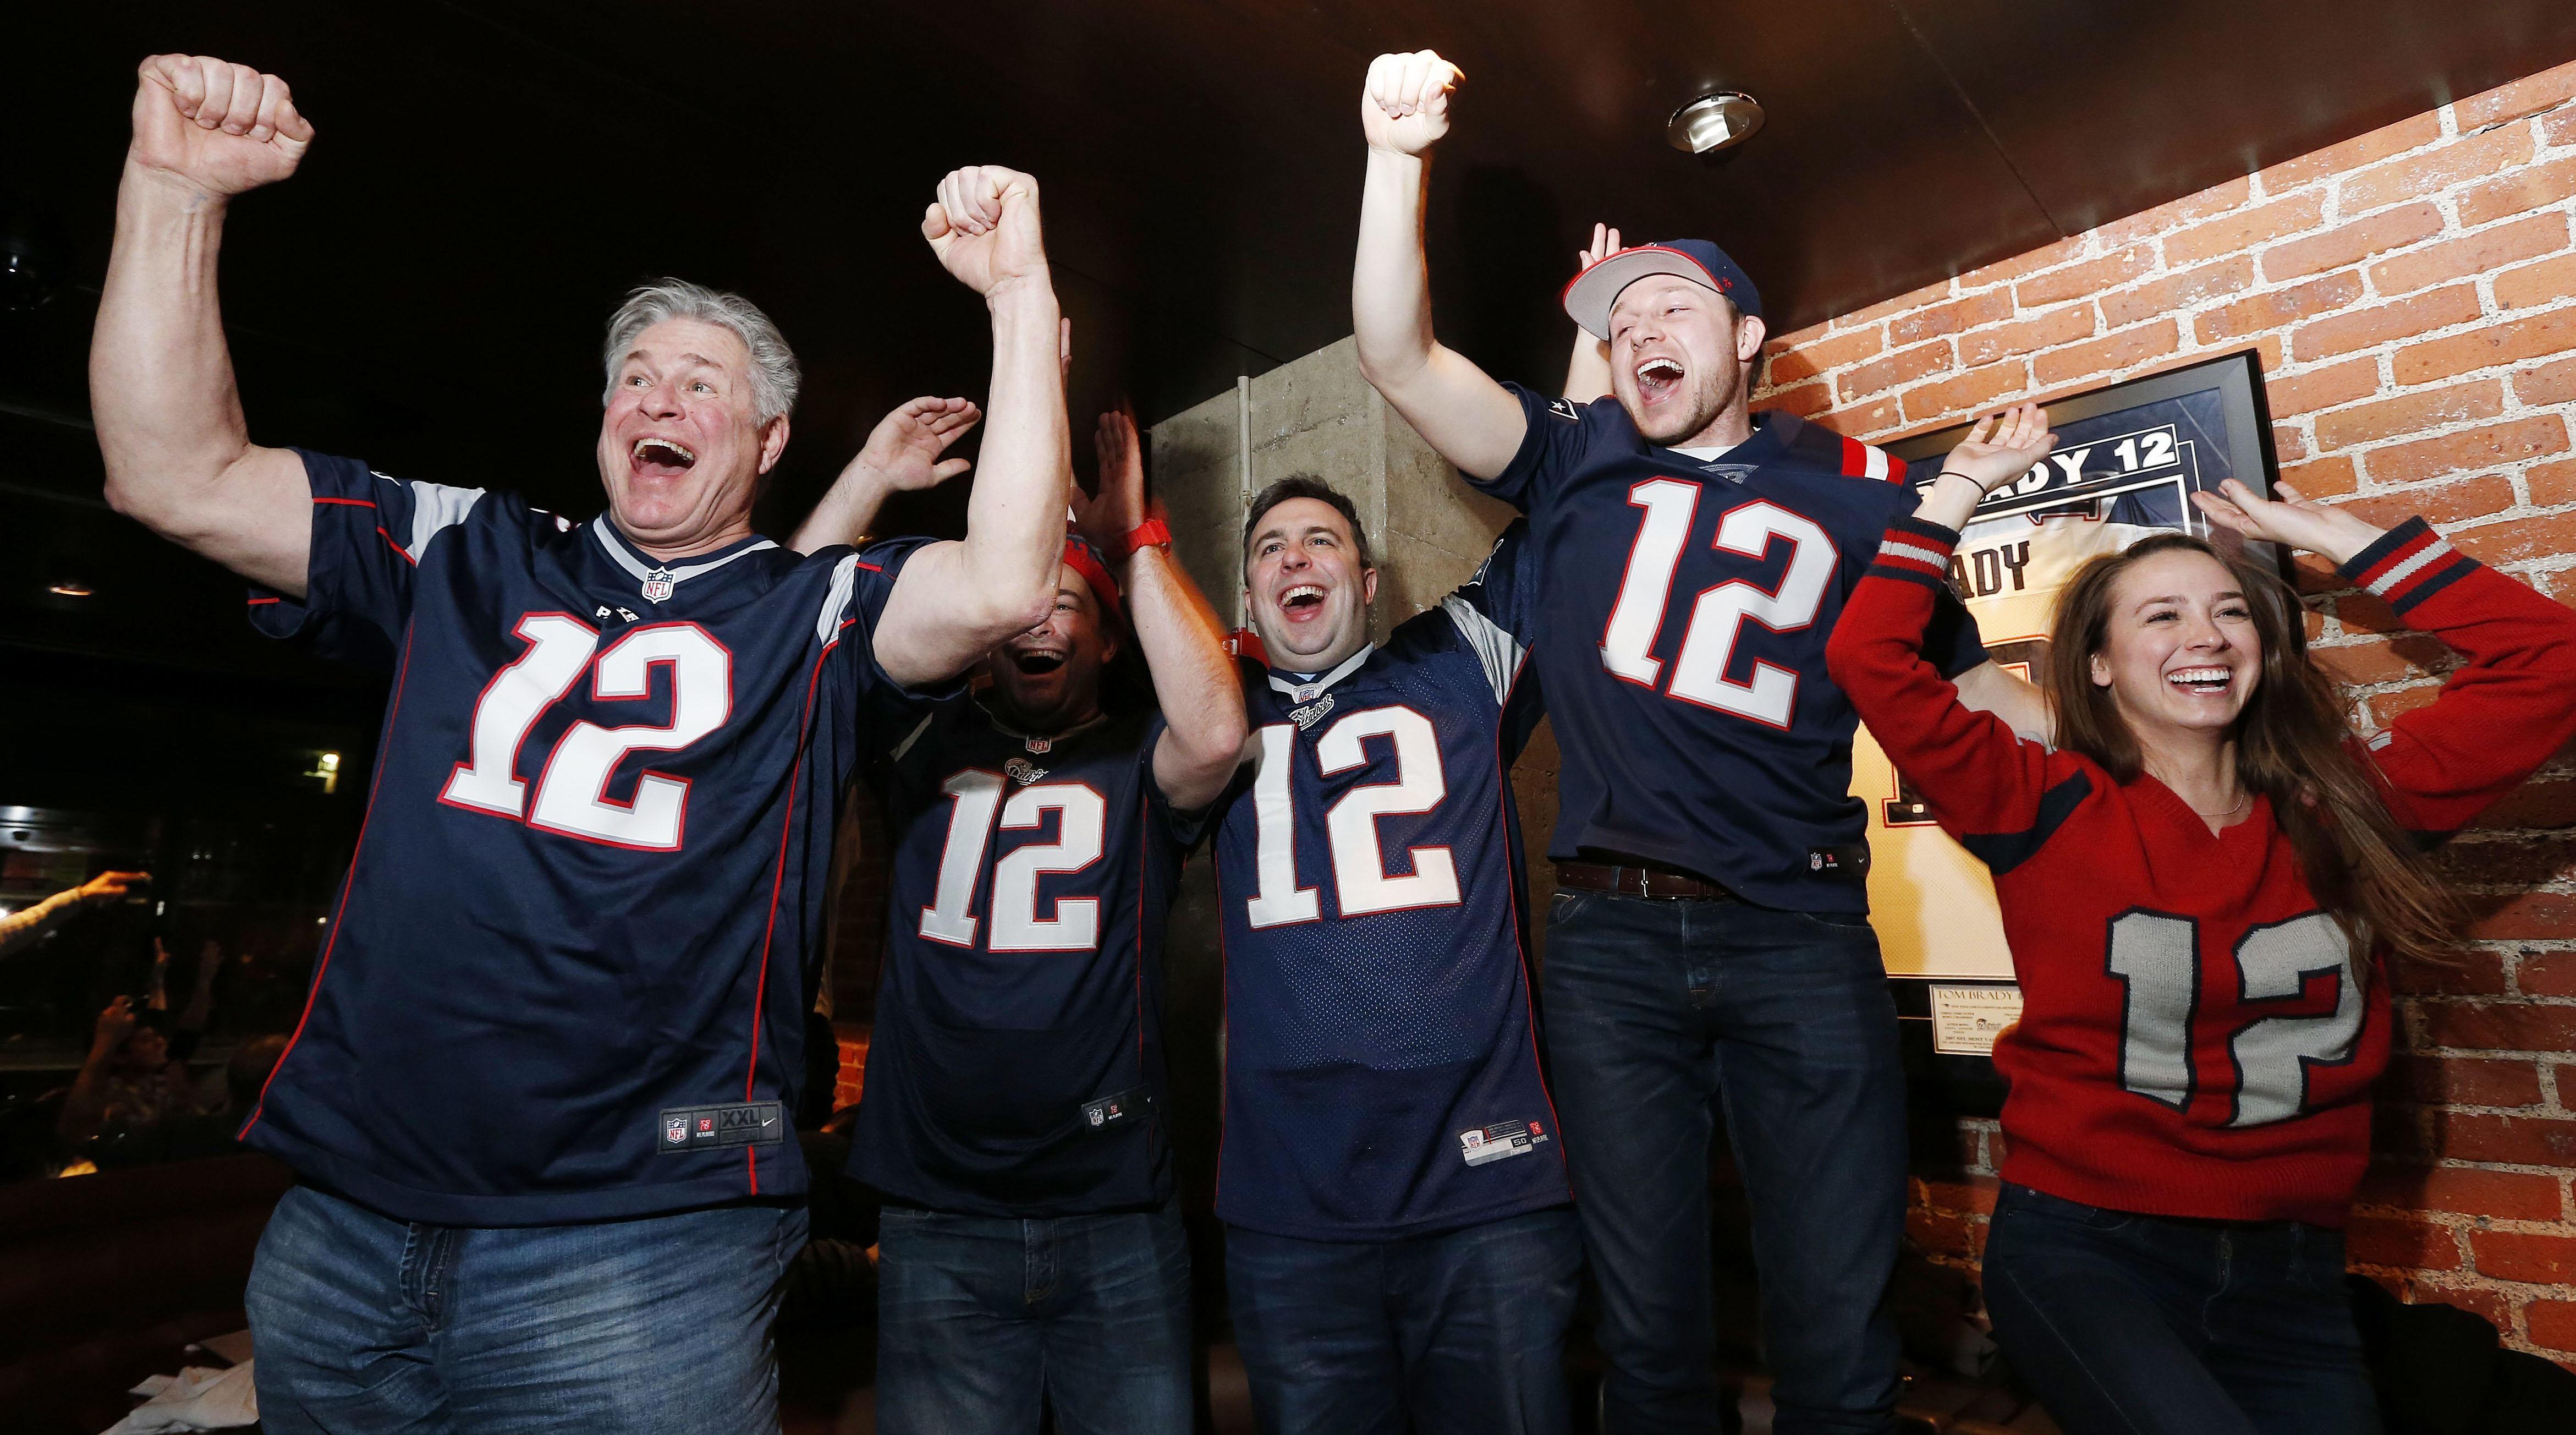 Patriots fans react to James White's Super Bowl-winning touchdown.